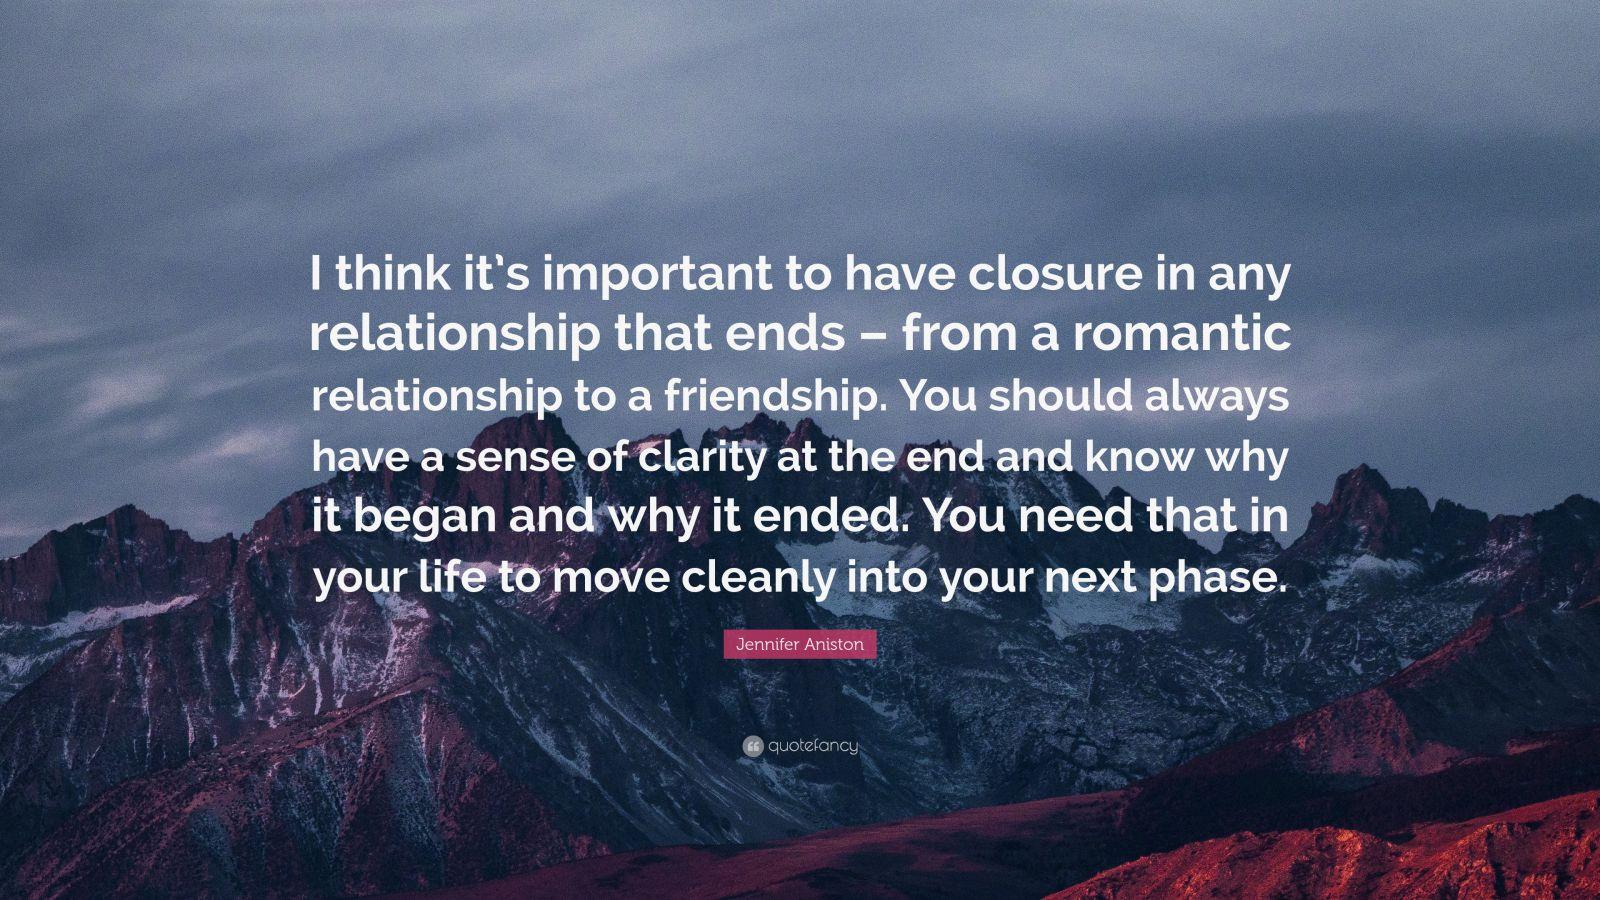 x files closure ending relationship